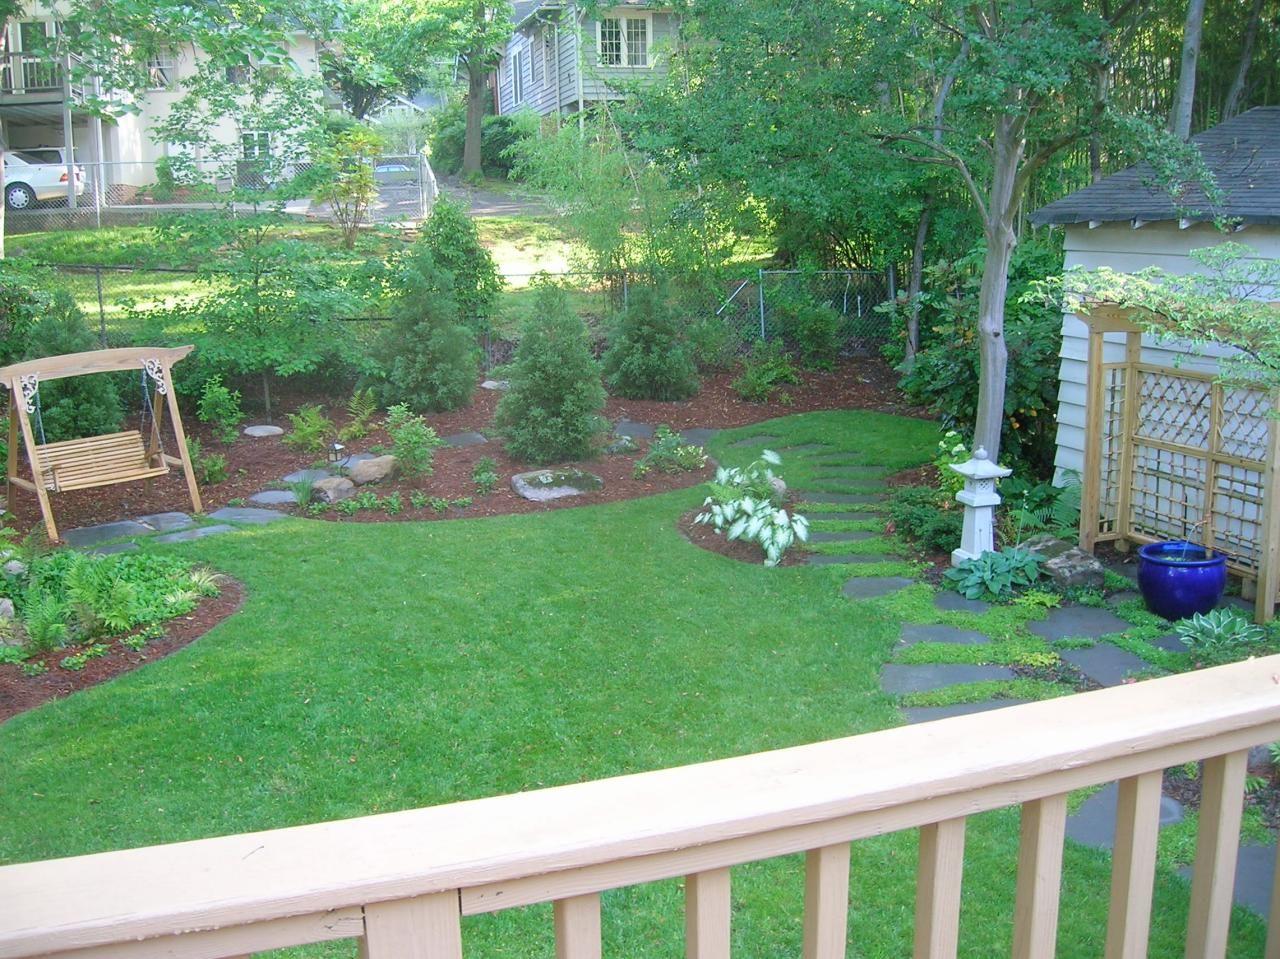 Before U0026 After: Big Backyard Makeovers | Landscaping Ideas And Hardscape  Design | HGTV